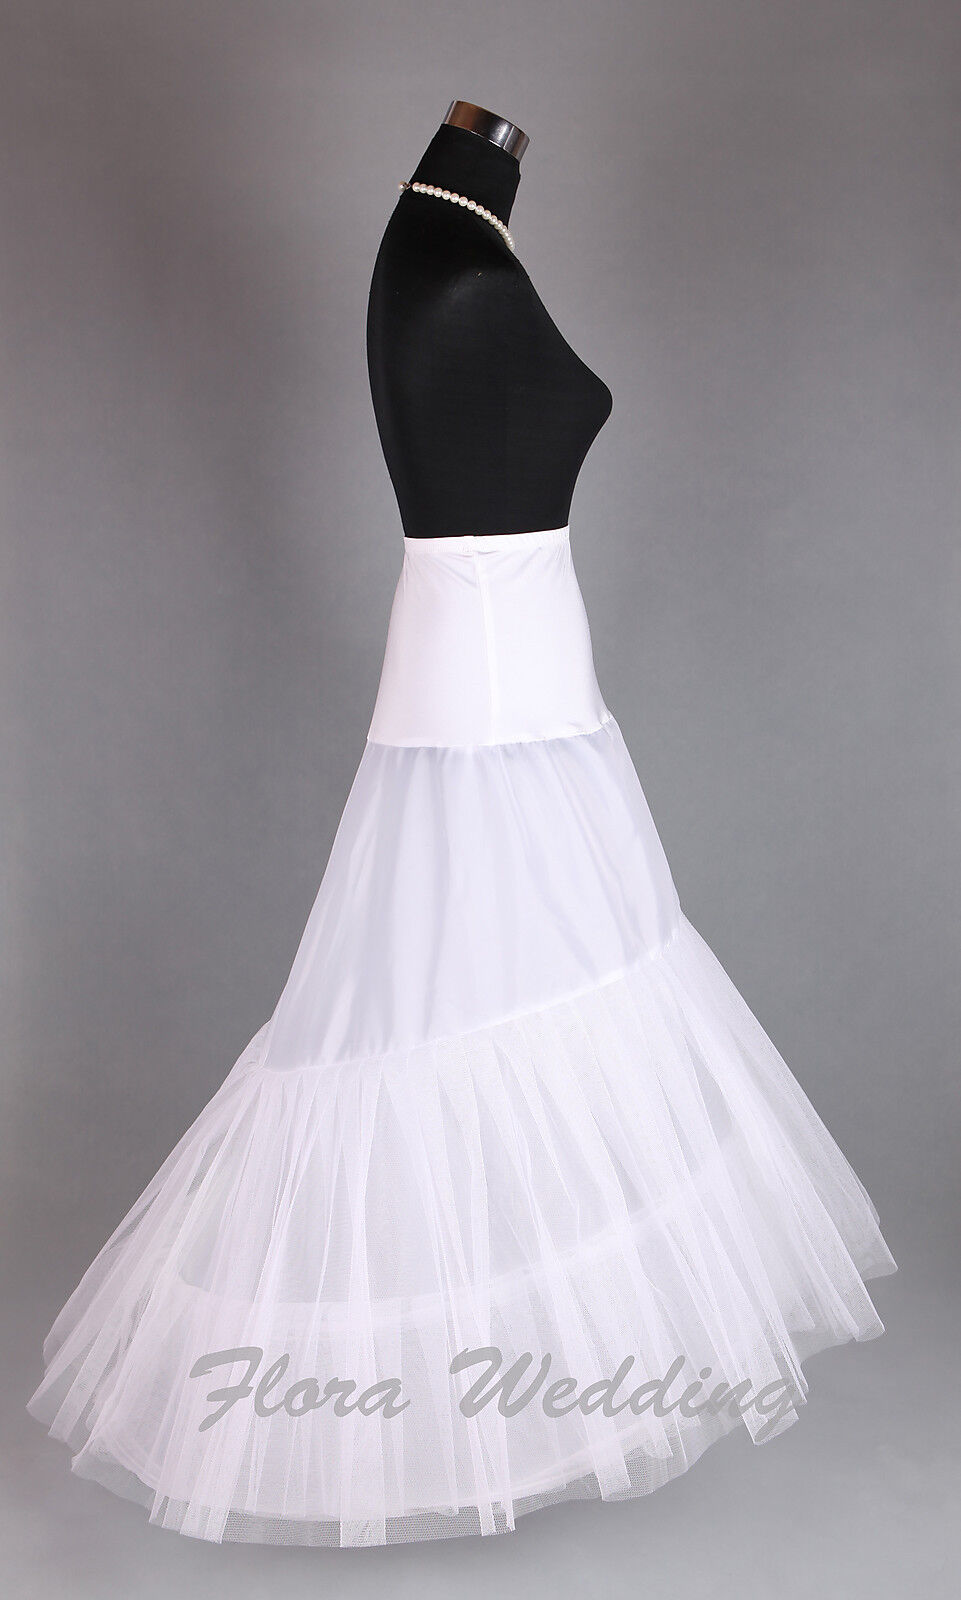 Wedding Petticoat Bridal Hoop Hoopless Crinoline Prom